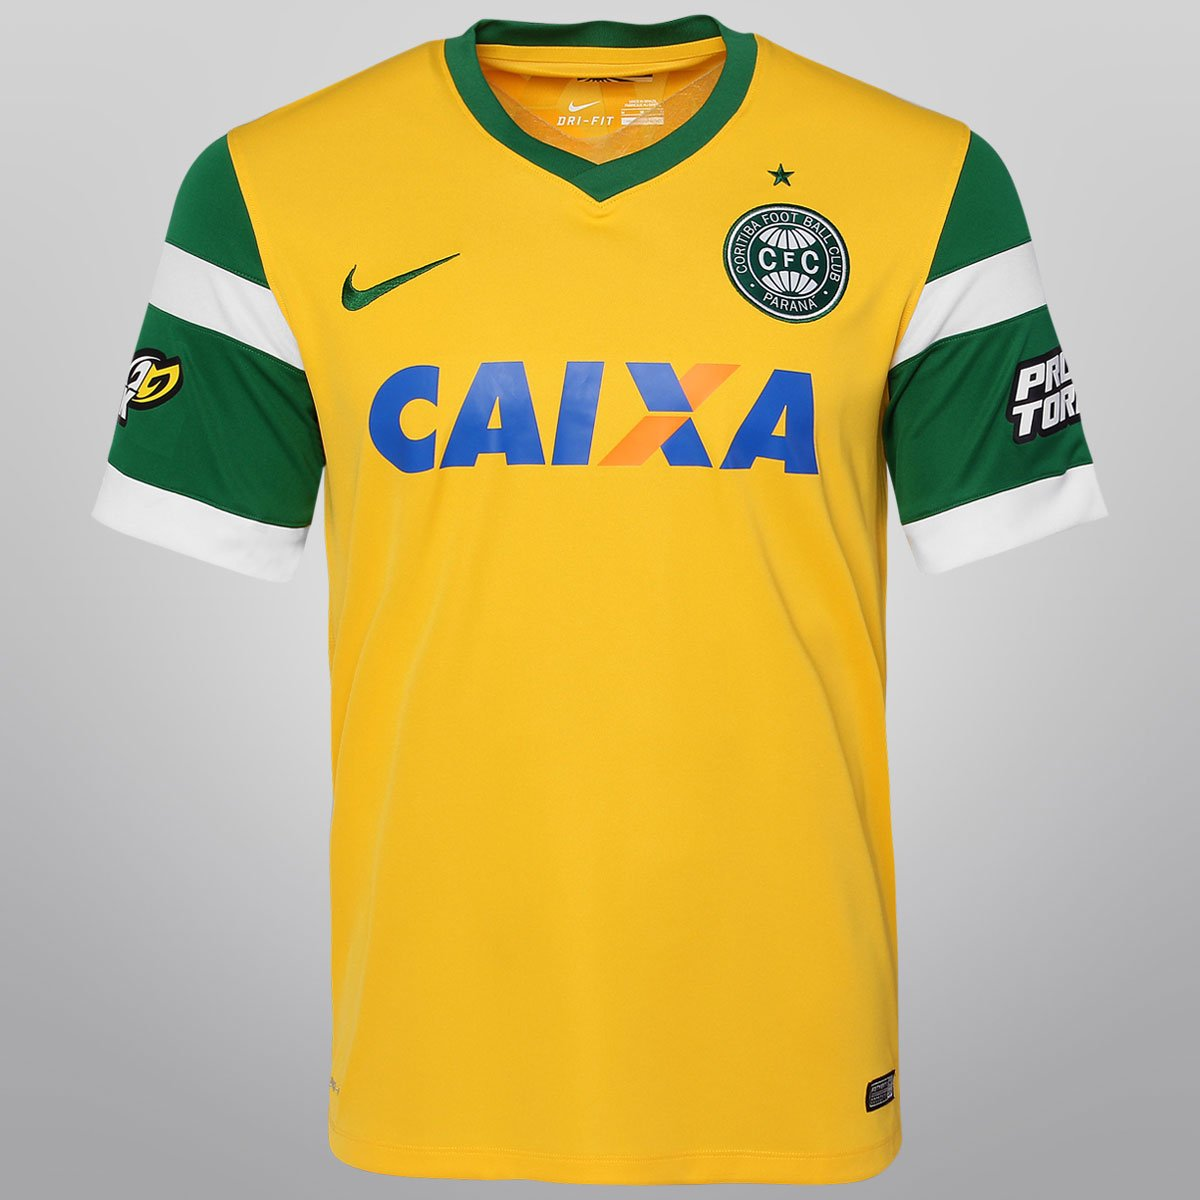 4e3168873f123 Camisa Nike Coritiba III 2014 s nº - Compre Agora